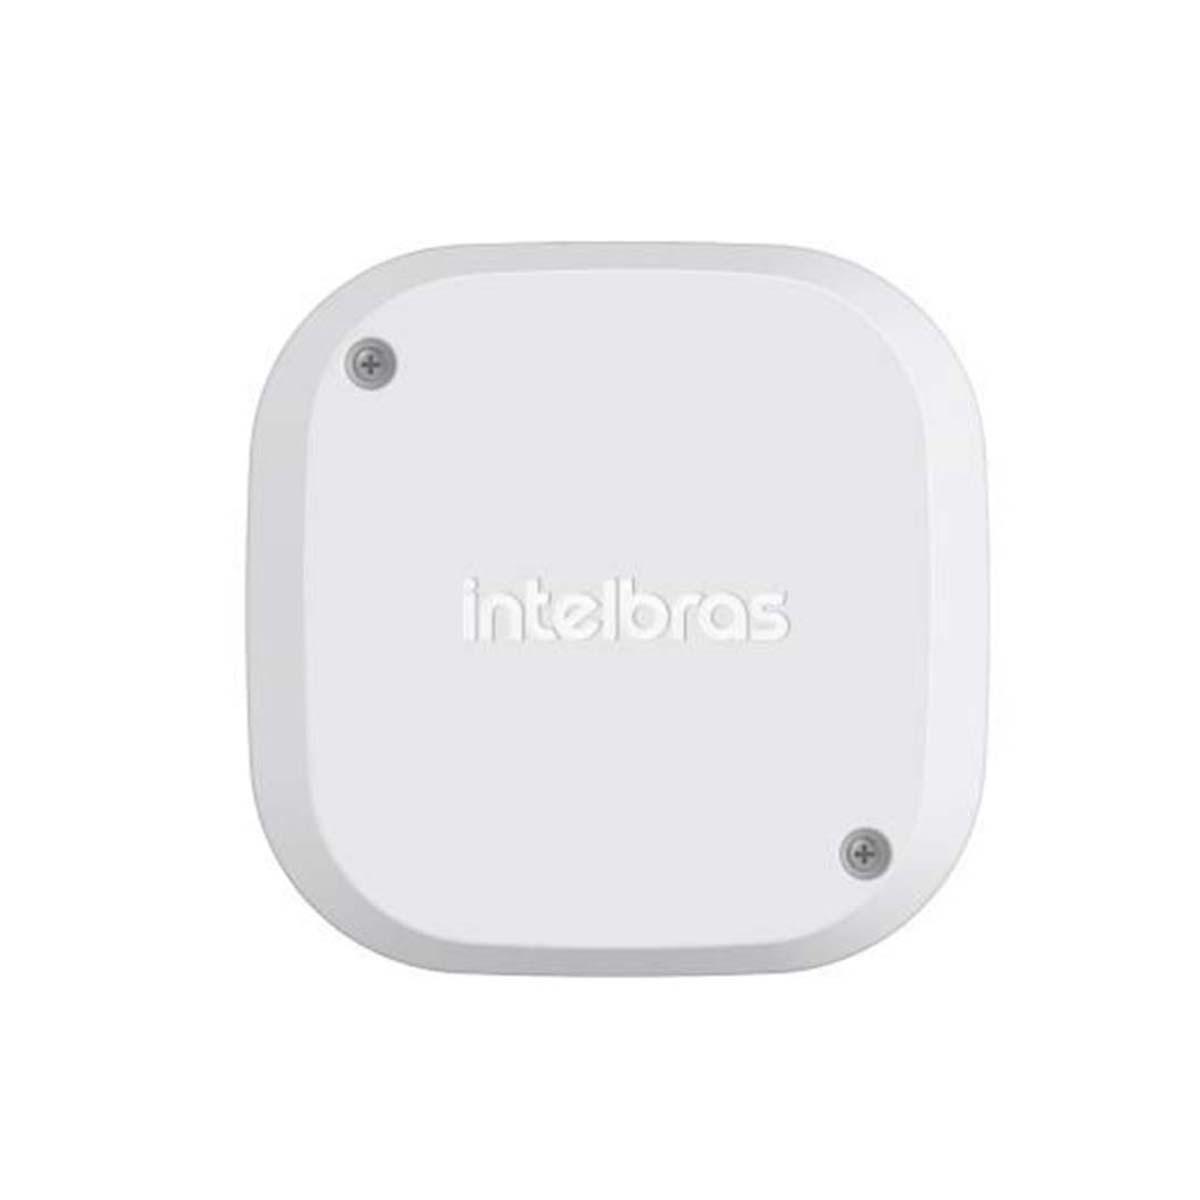 KIT 06 CAIXA PLASTICA DE PASSAGEM VBOX 1100 INTELBRAS